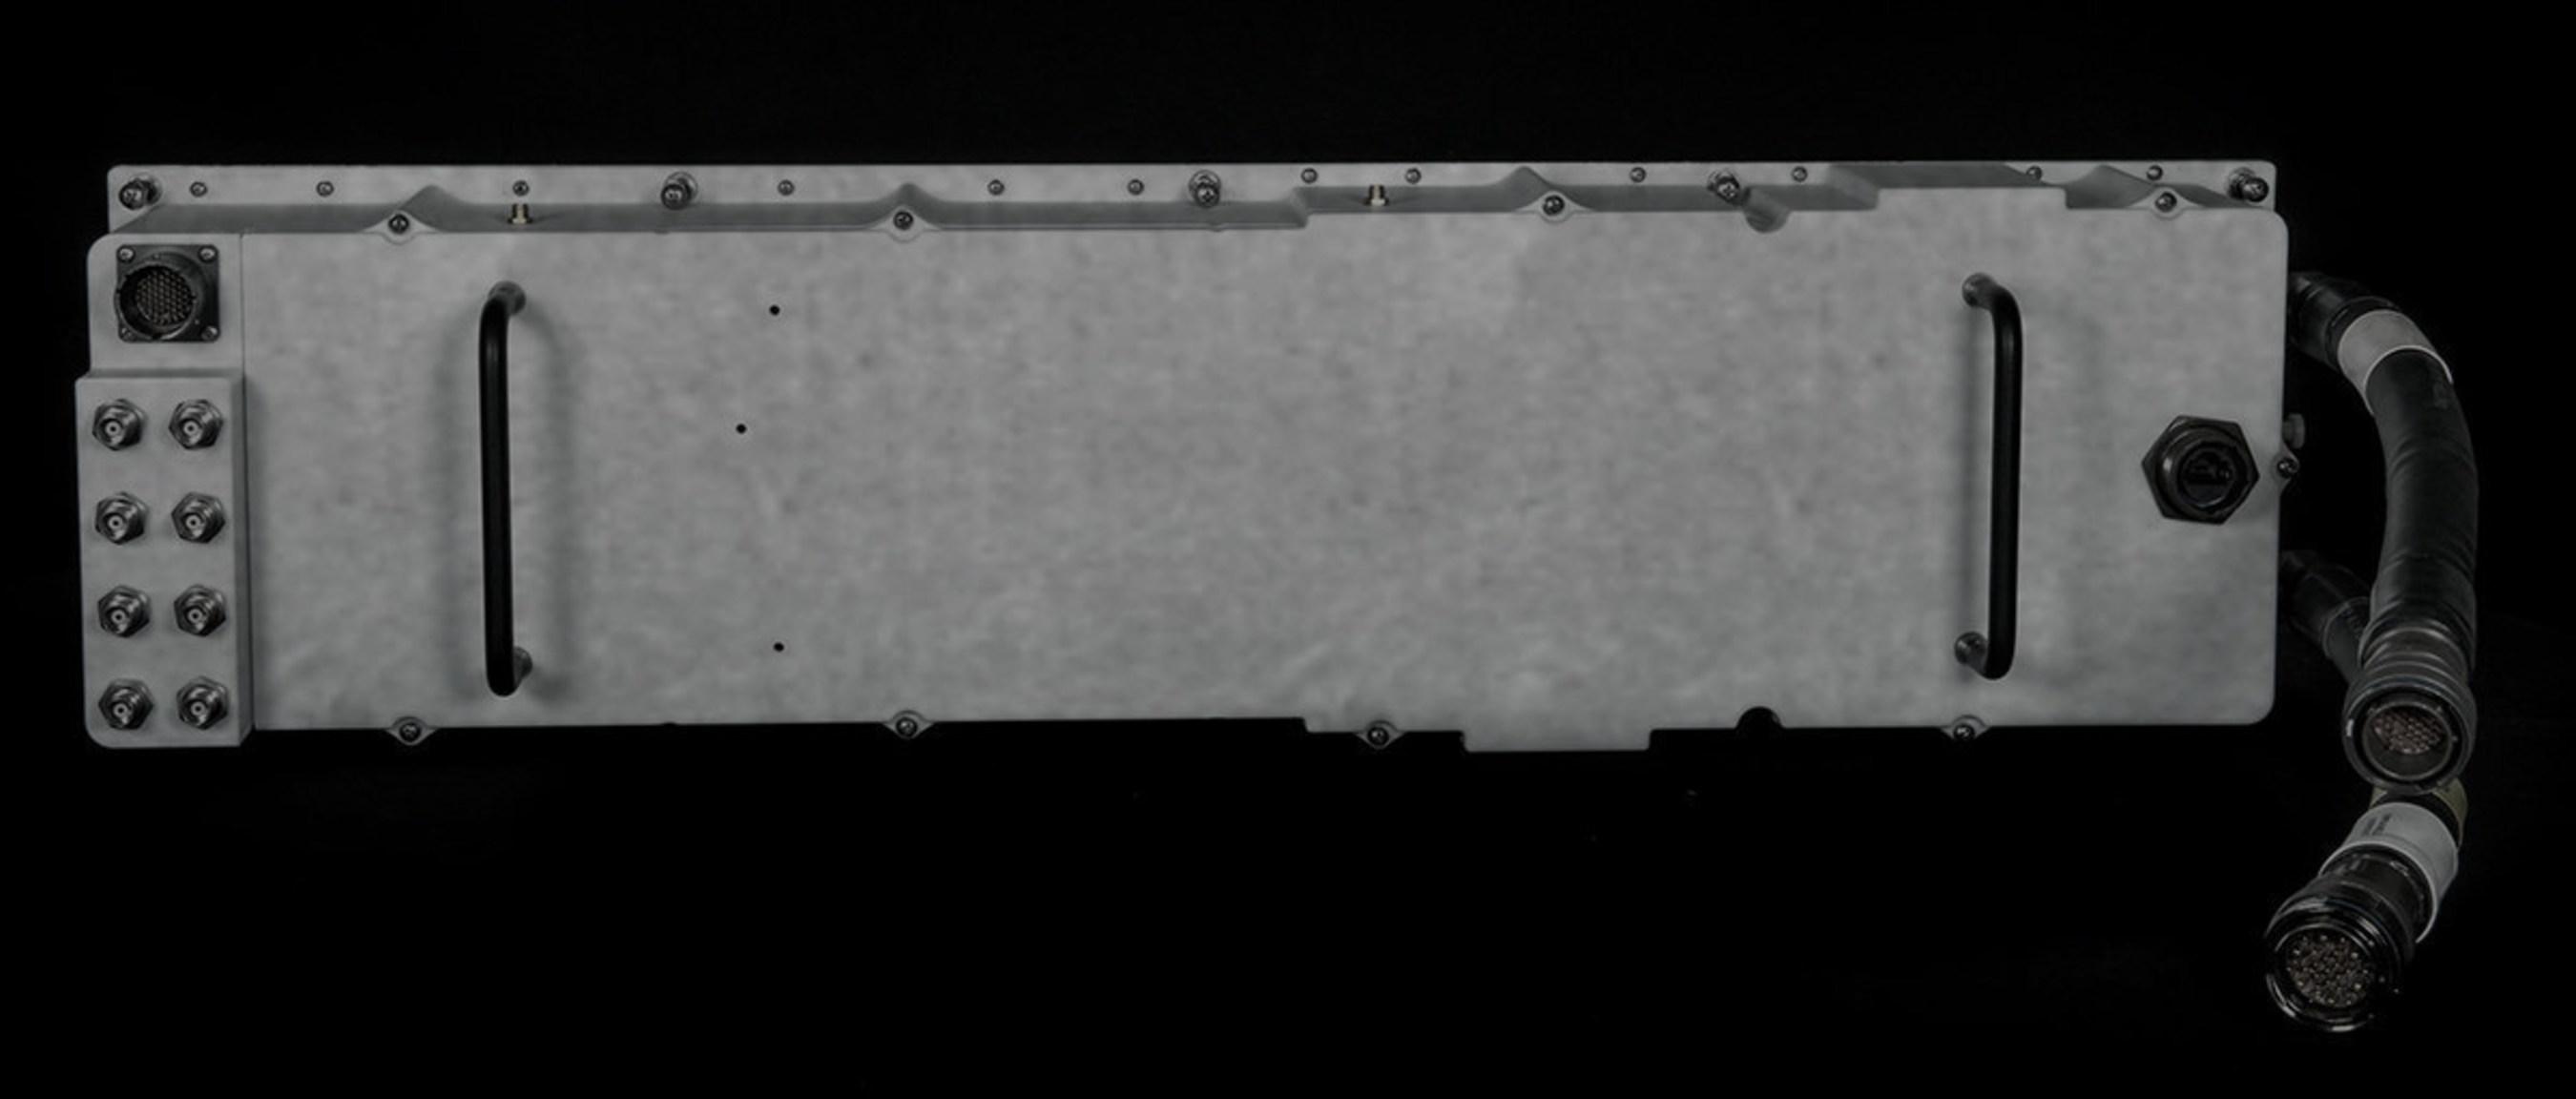 Lockheed Martin's new Digital Array Row Transceiver (DART) is a combined transmit and receive LRU with Gallium Nitride (GaN) T/R modules. Photo courtesy Lockheed Martin.